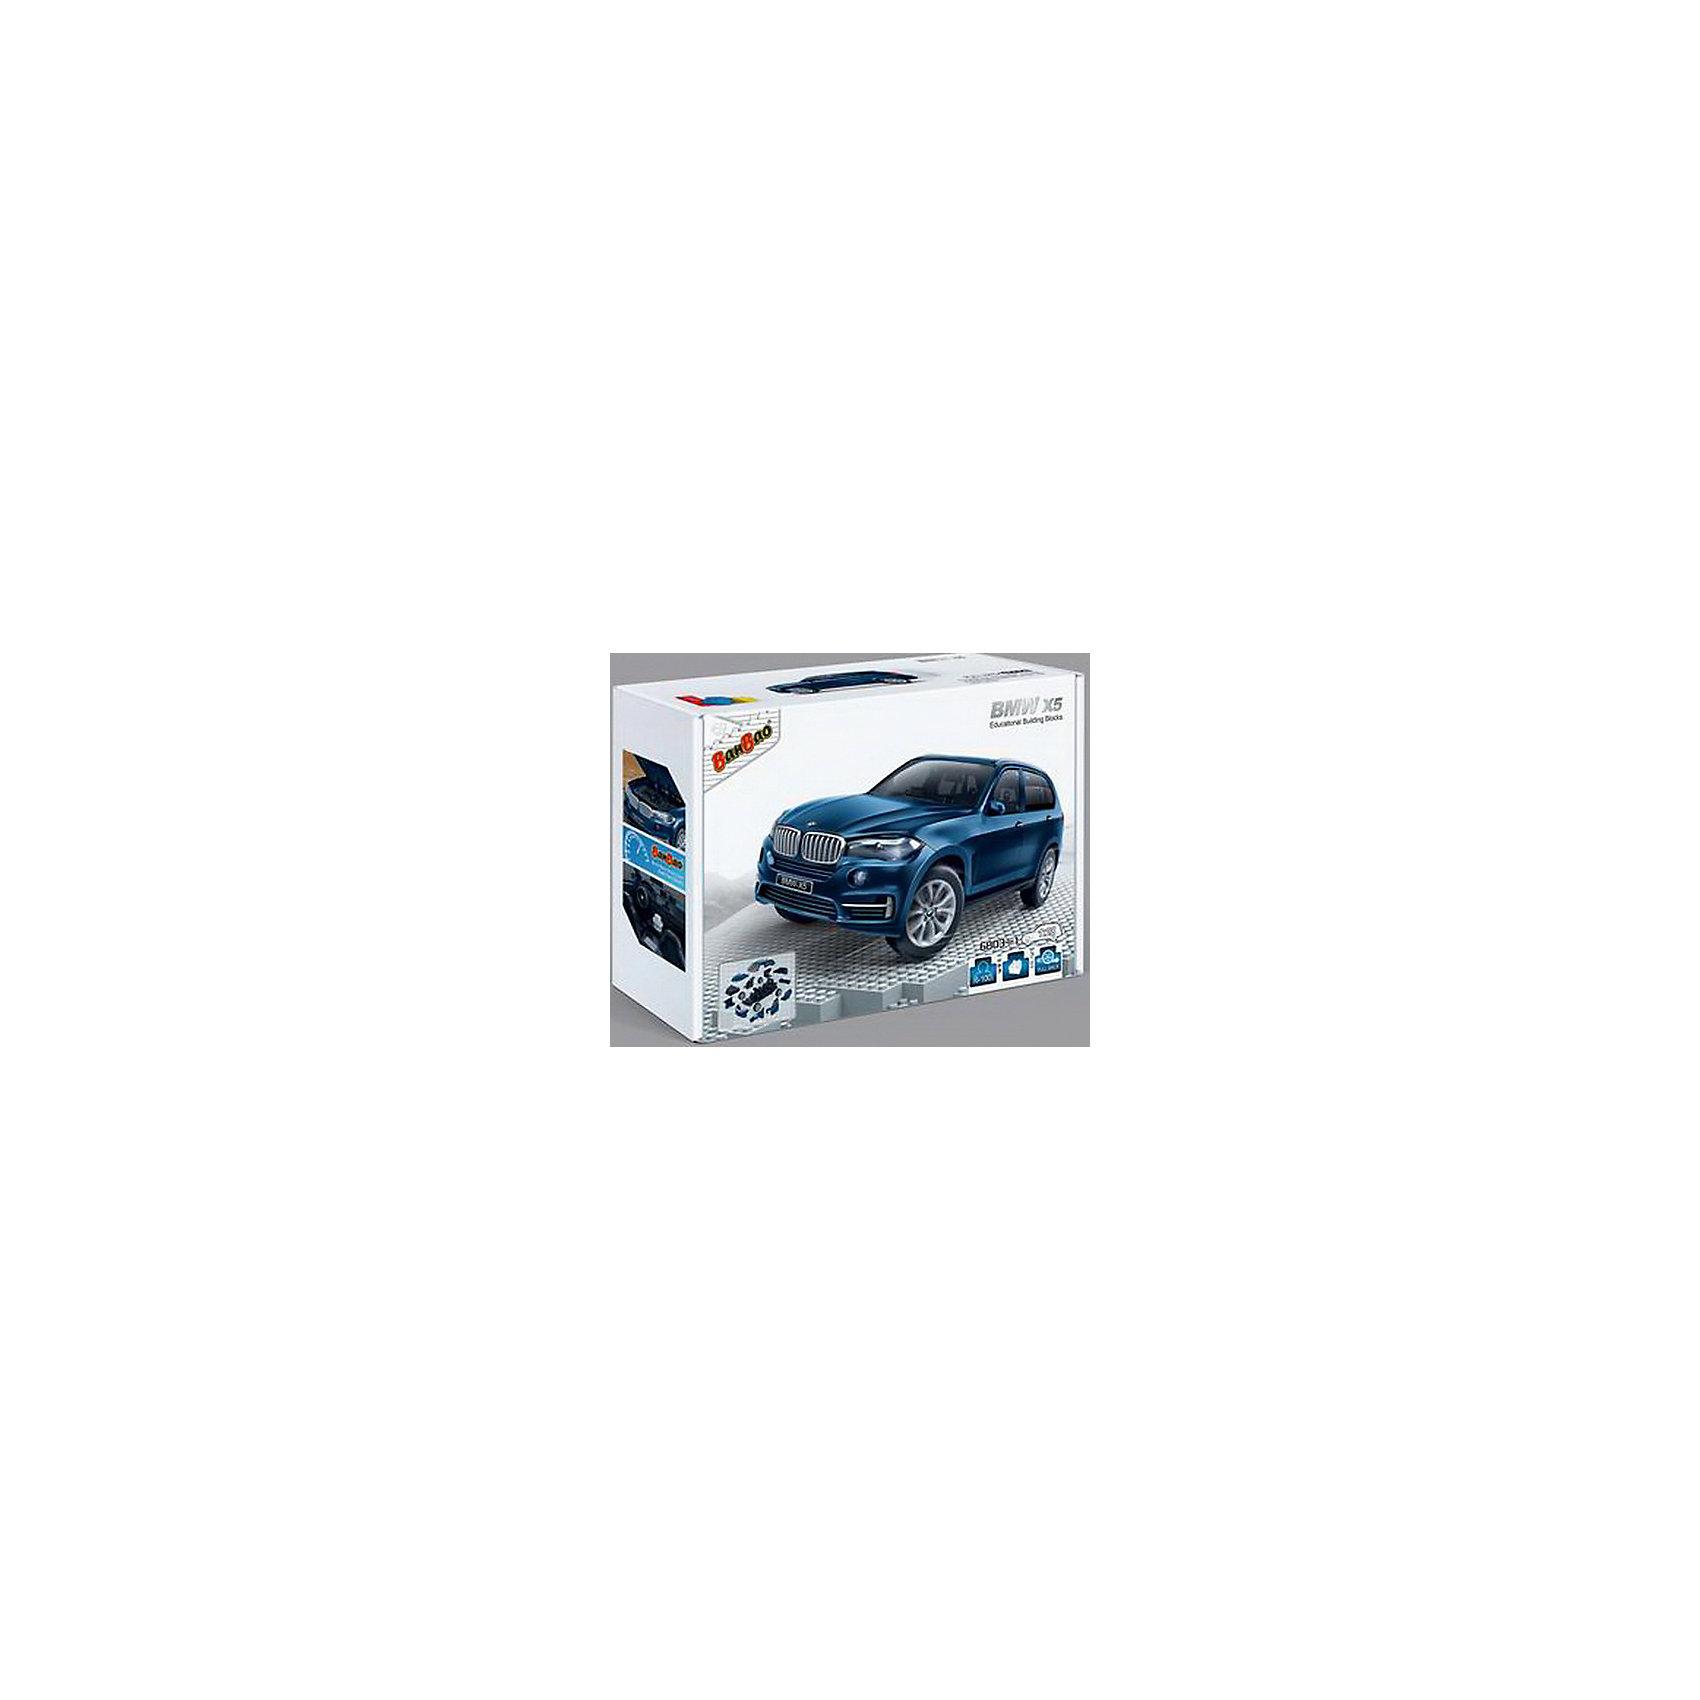 Конструктор Машина BMW X5, синий цвет, 1:28, BanBaoКонструктор Машина BMW X5 (синий цвет), масштаб 1:28, 26.5х18.5х8см<br><br>Ширина мм: 265<br>Глубина мм: 185<br>Высота мм: 80<br>Вес г: 500<br>Возраст от месяцев: 60<br>Возраст до месяцев: 1188<br>Пол: Мужской<br>Возраст: Детский<br>SKU: 5528490